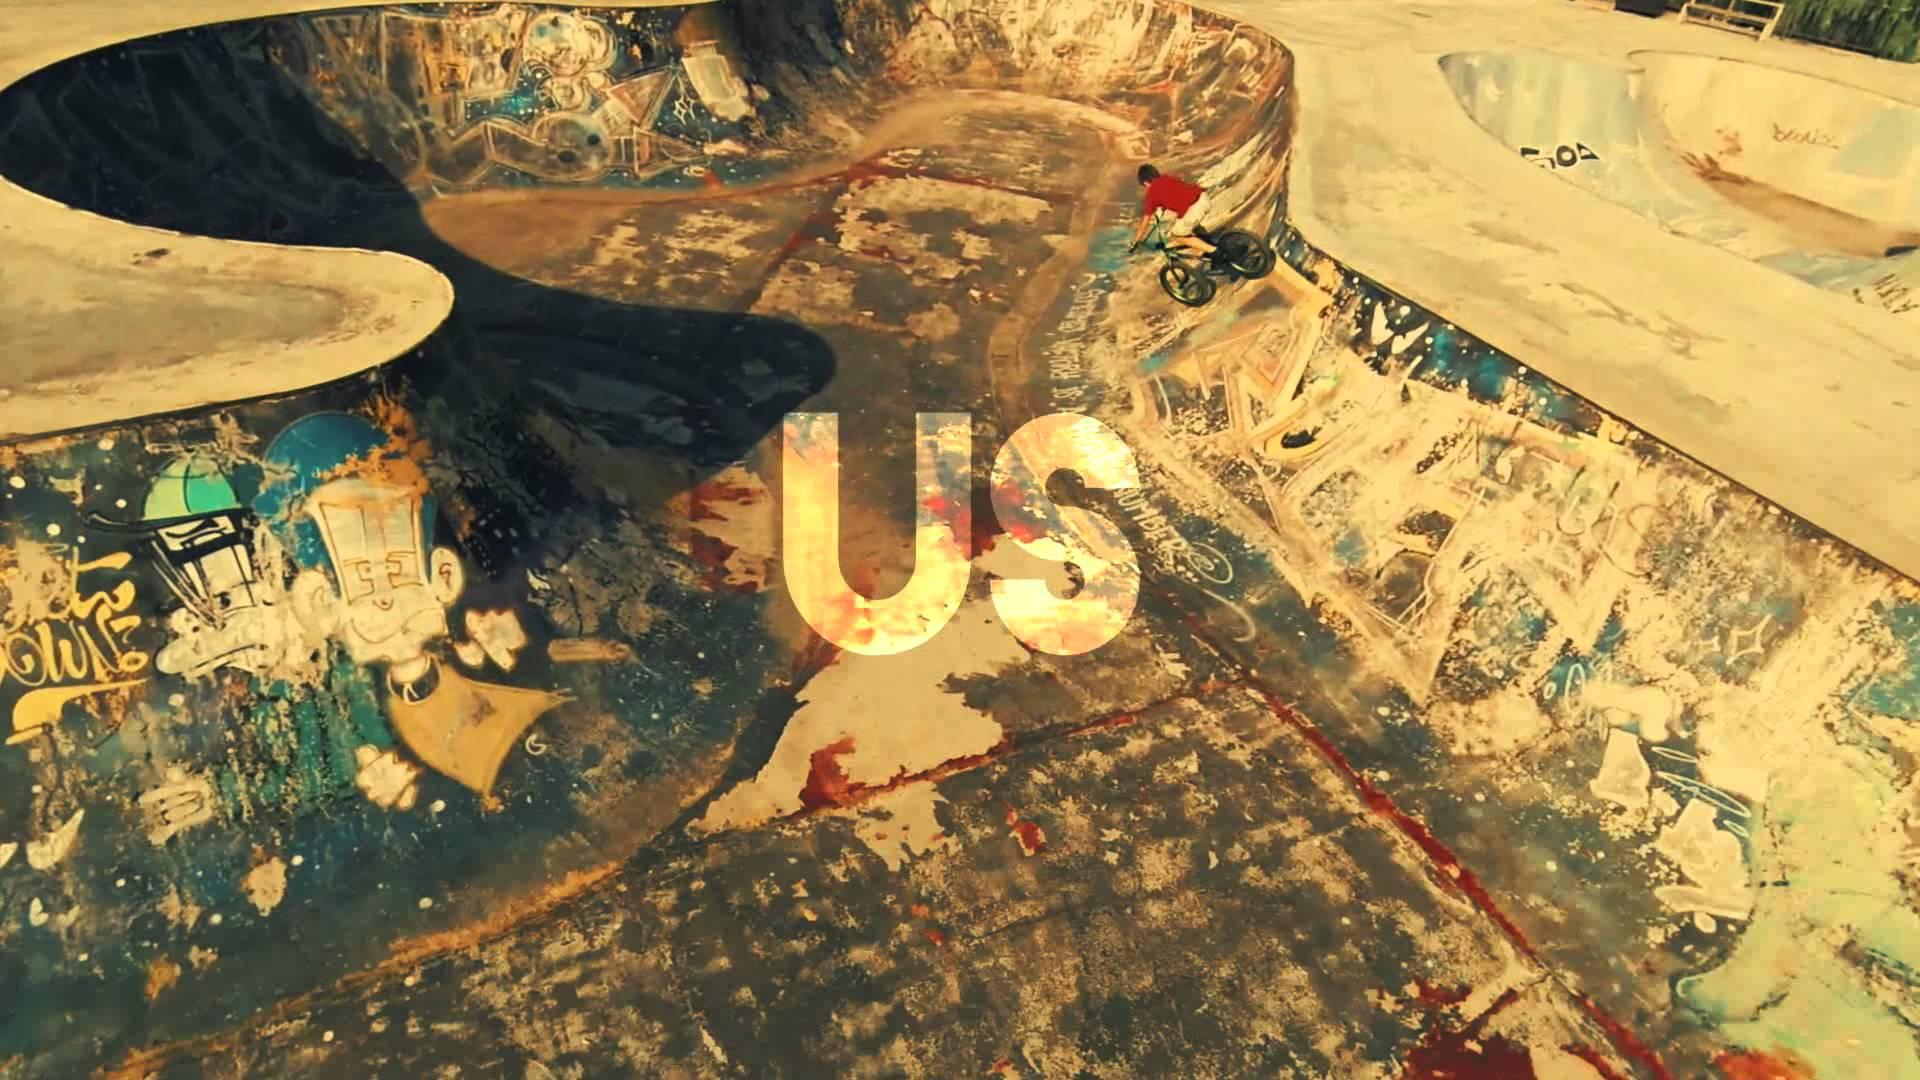 Tom Swoon et Lush & Simon – Ahead Of Us (Lyric)